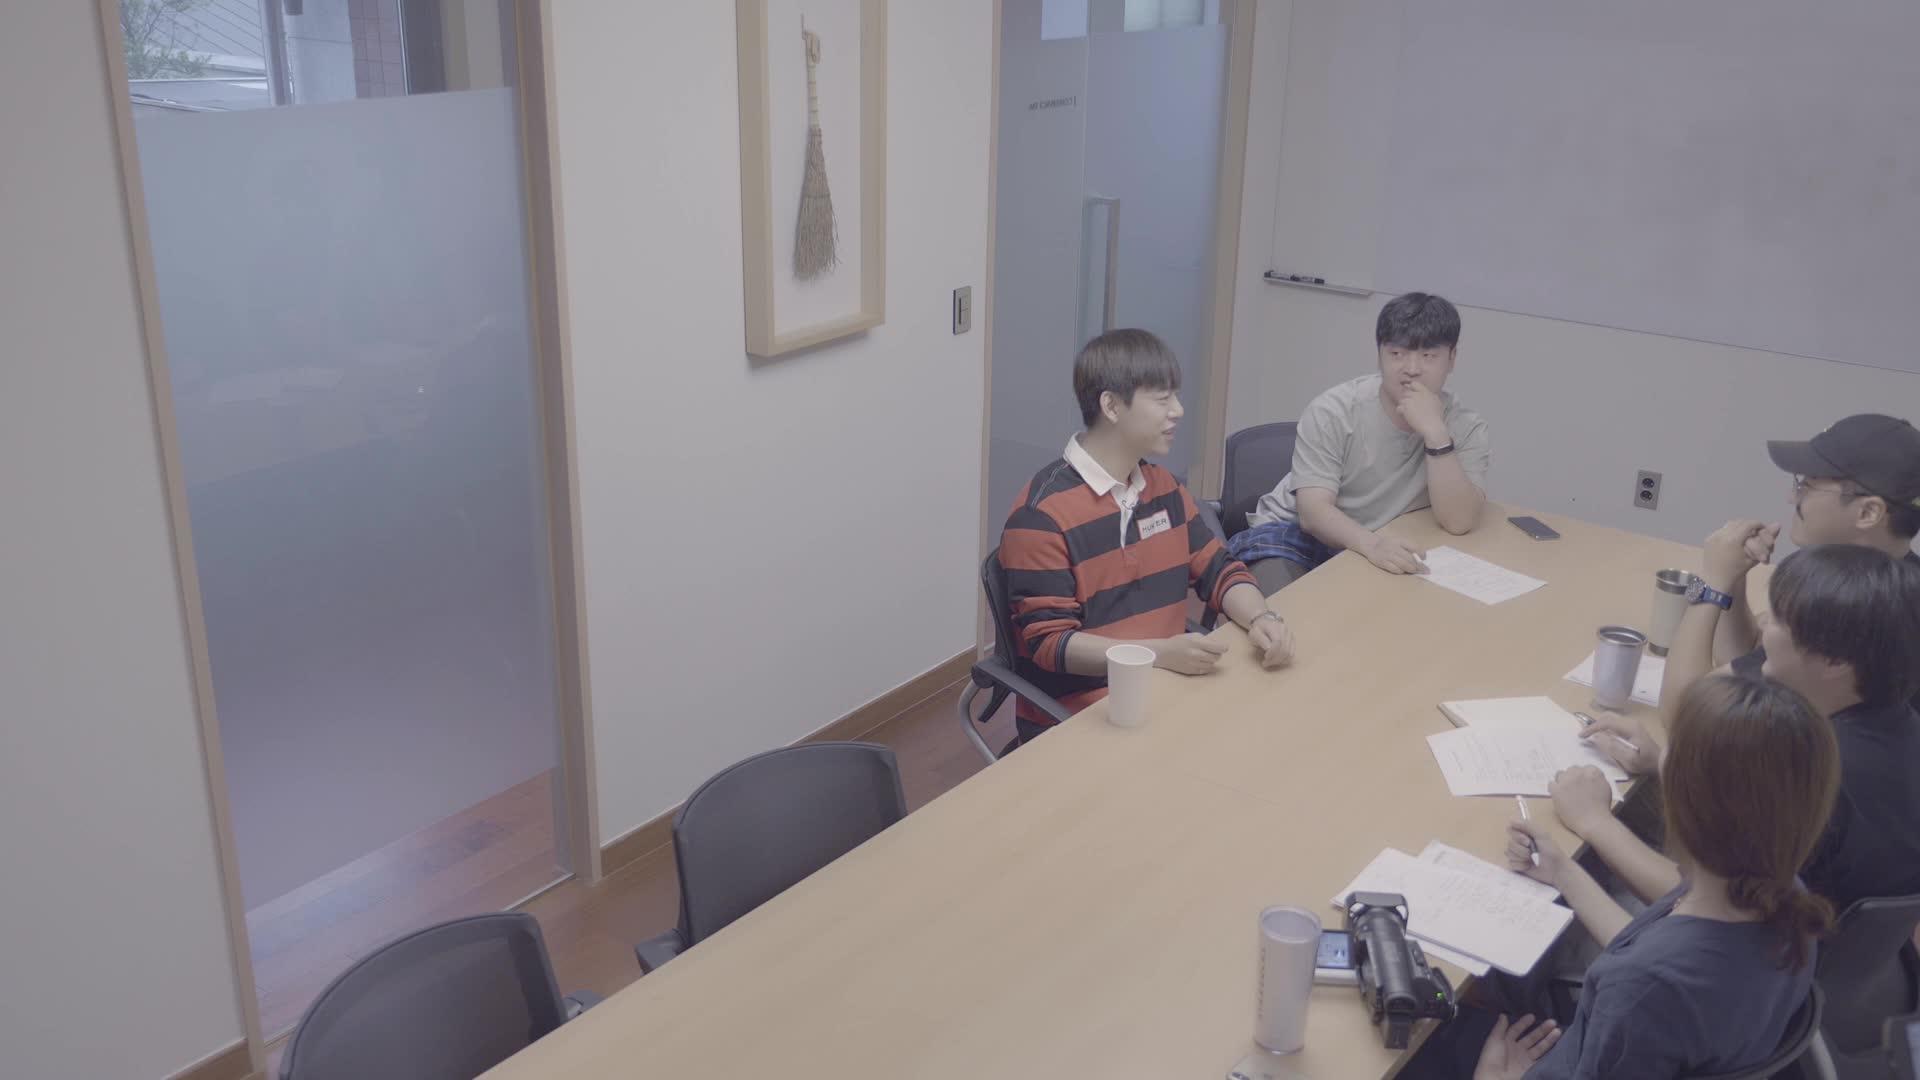 [Jung Dae Hyun] Reality Aight PROLOGUE